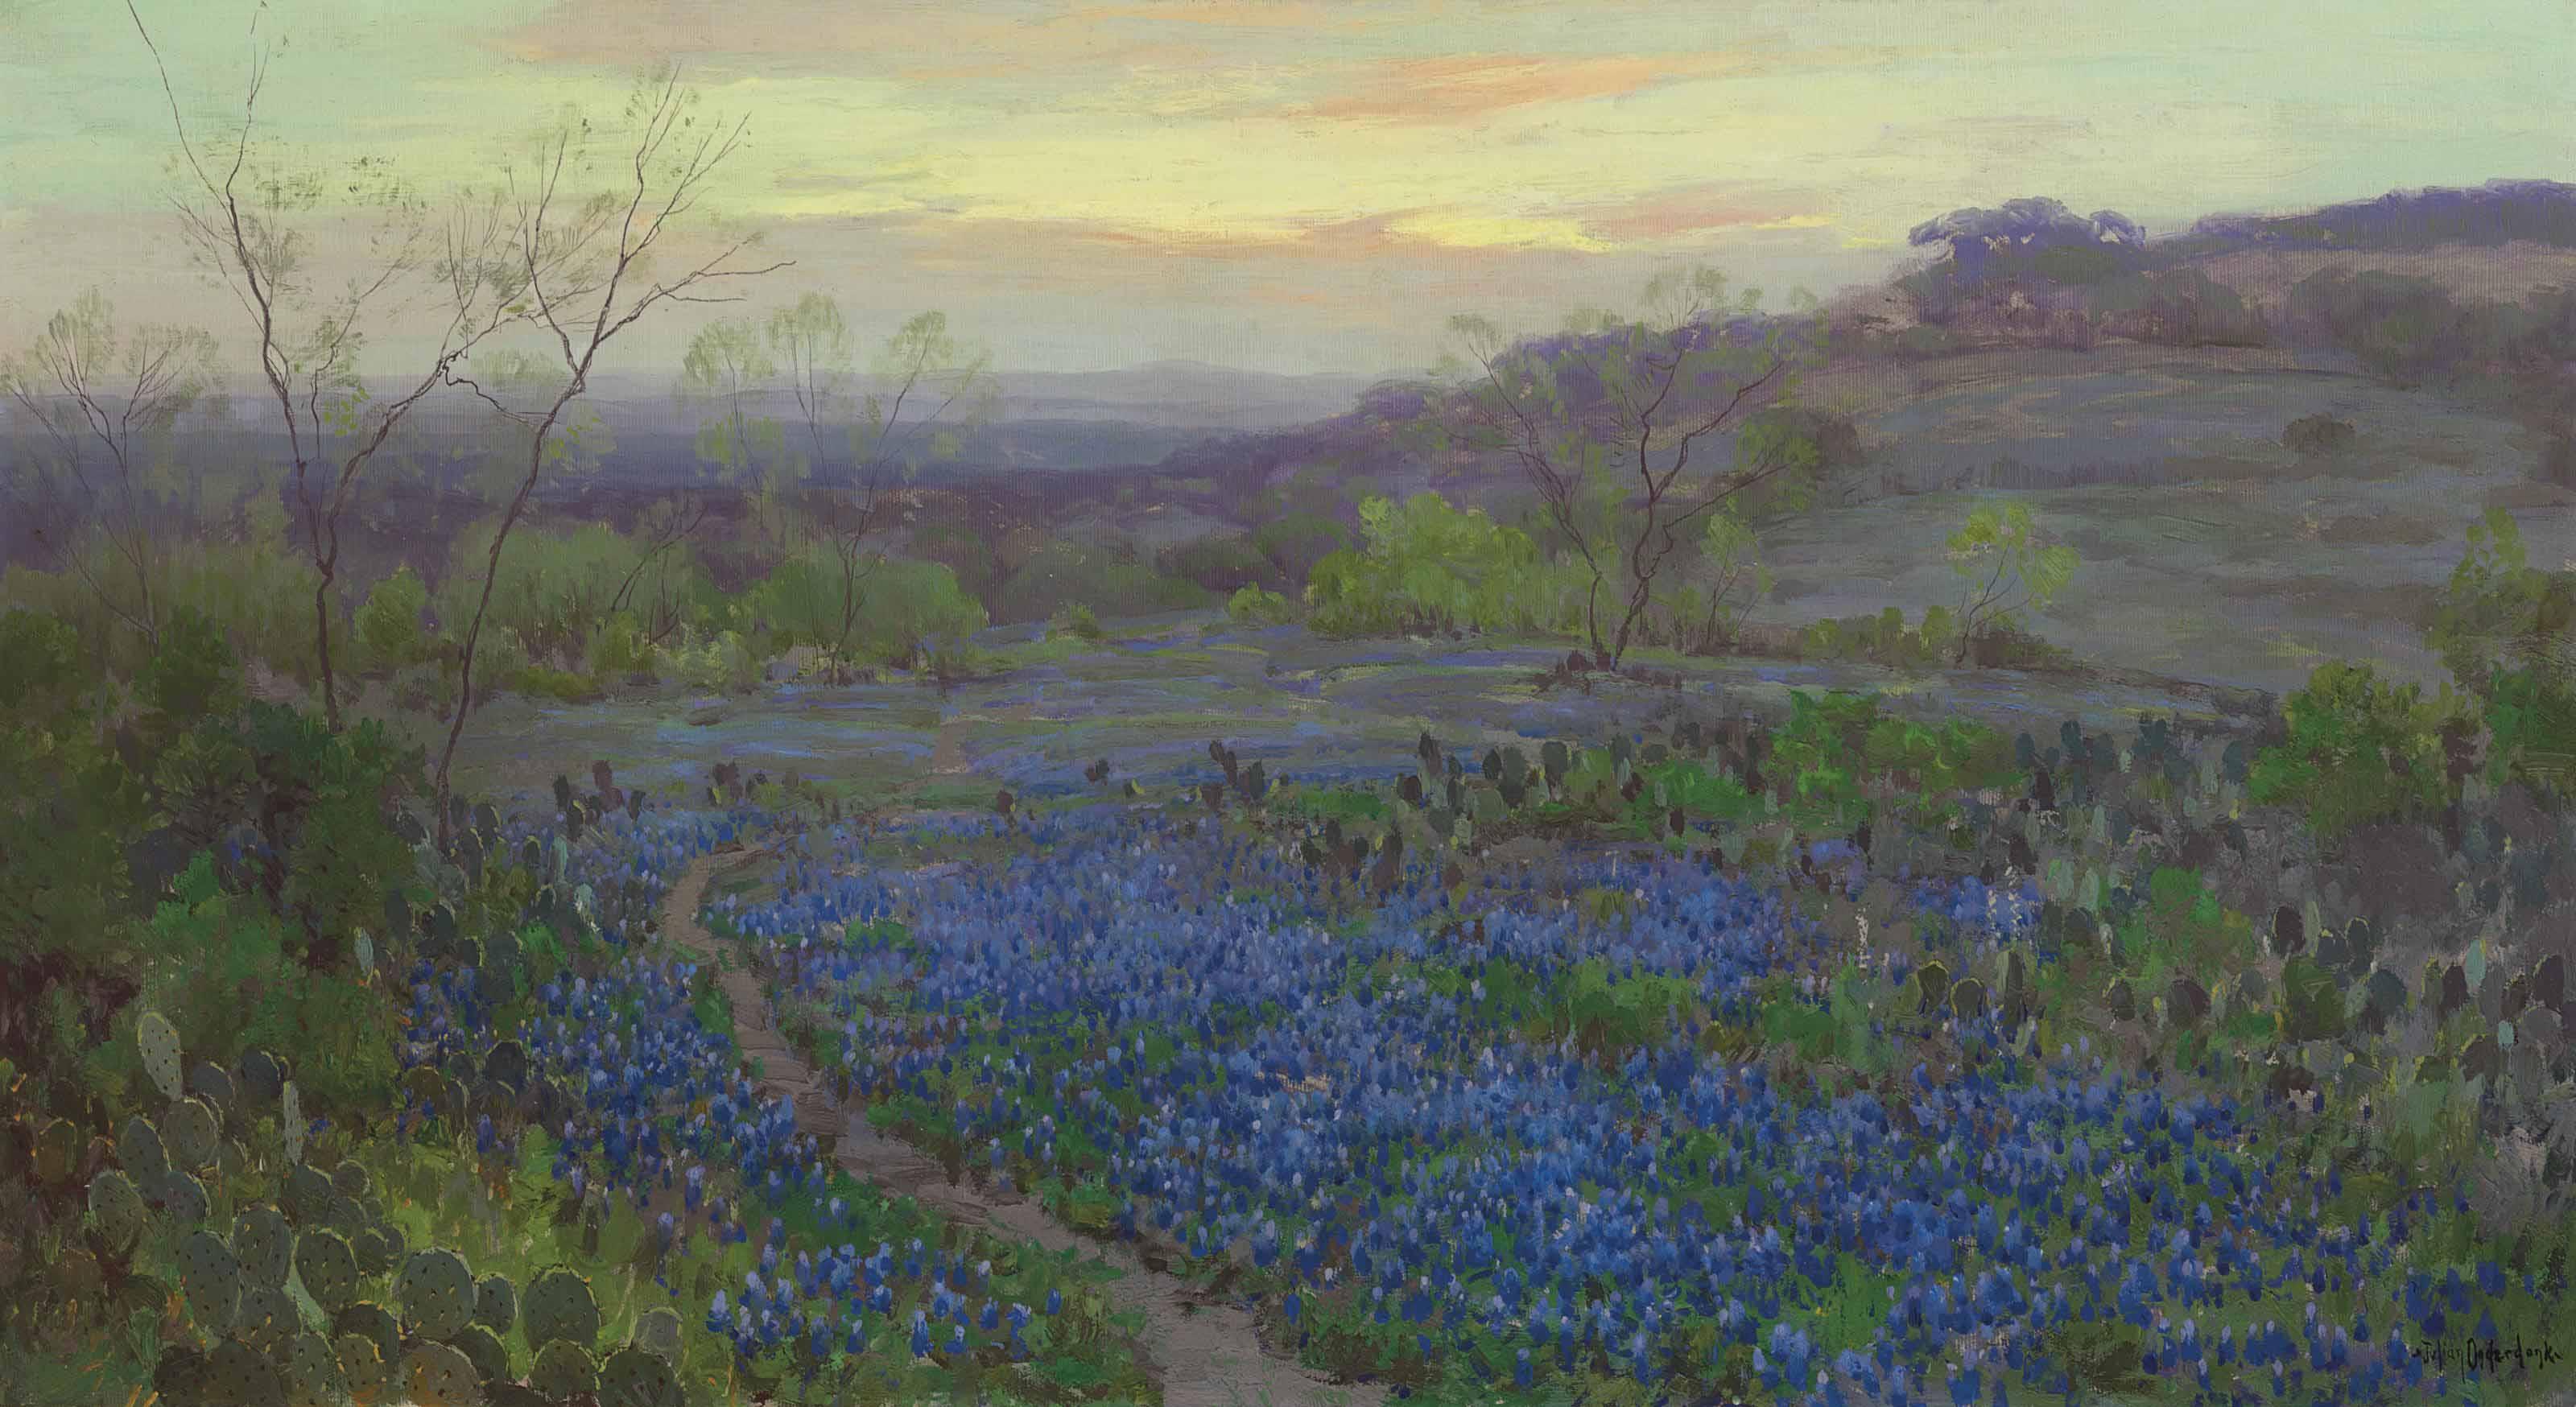 Blue Bonnets at Twilight